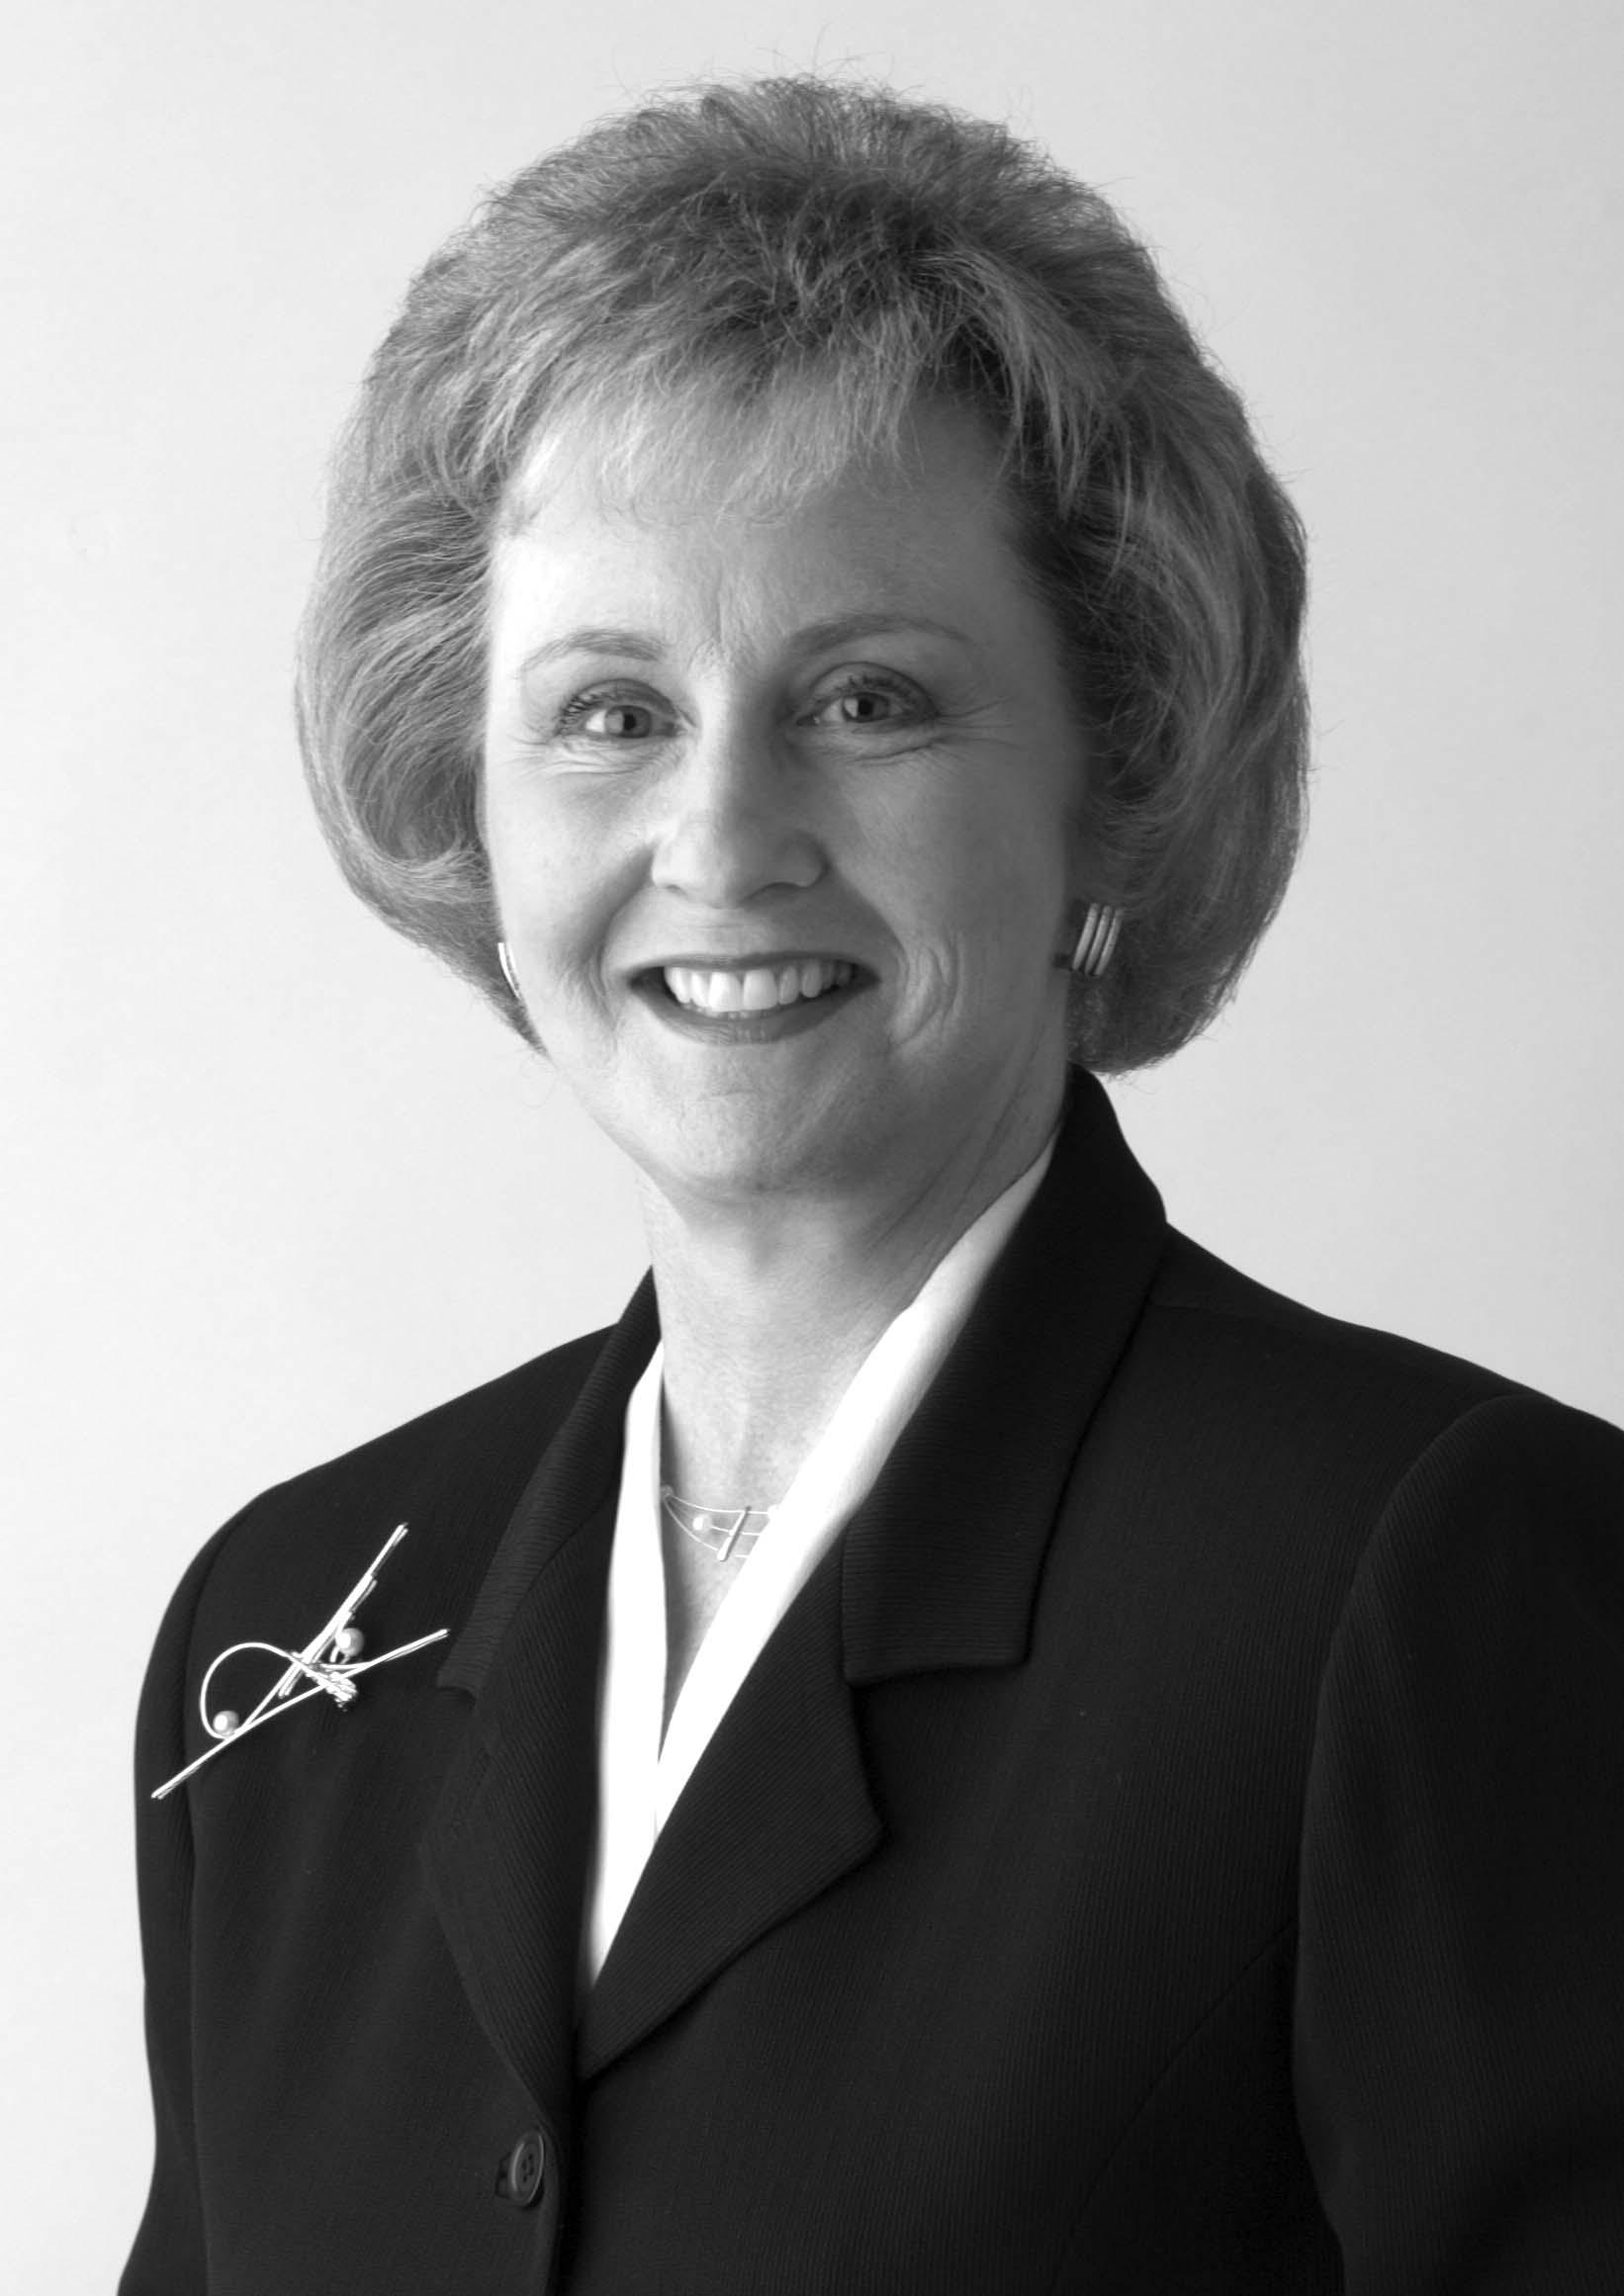 Dr. Joan Develin Coley